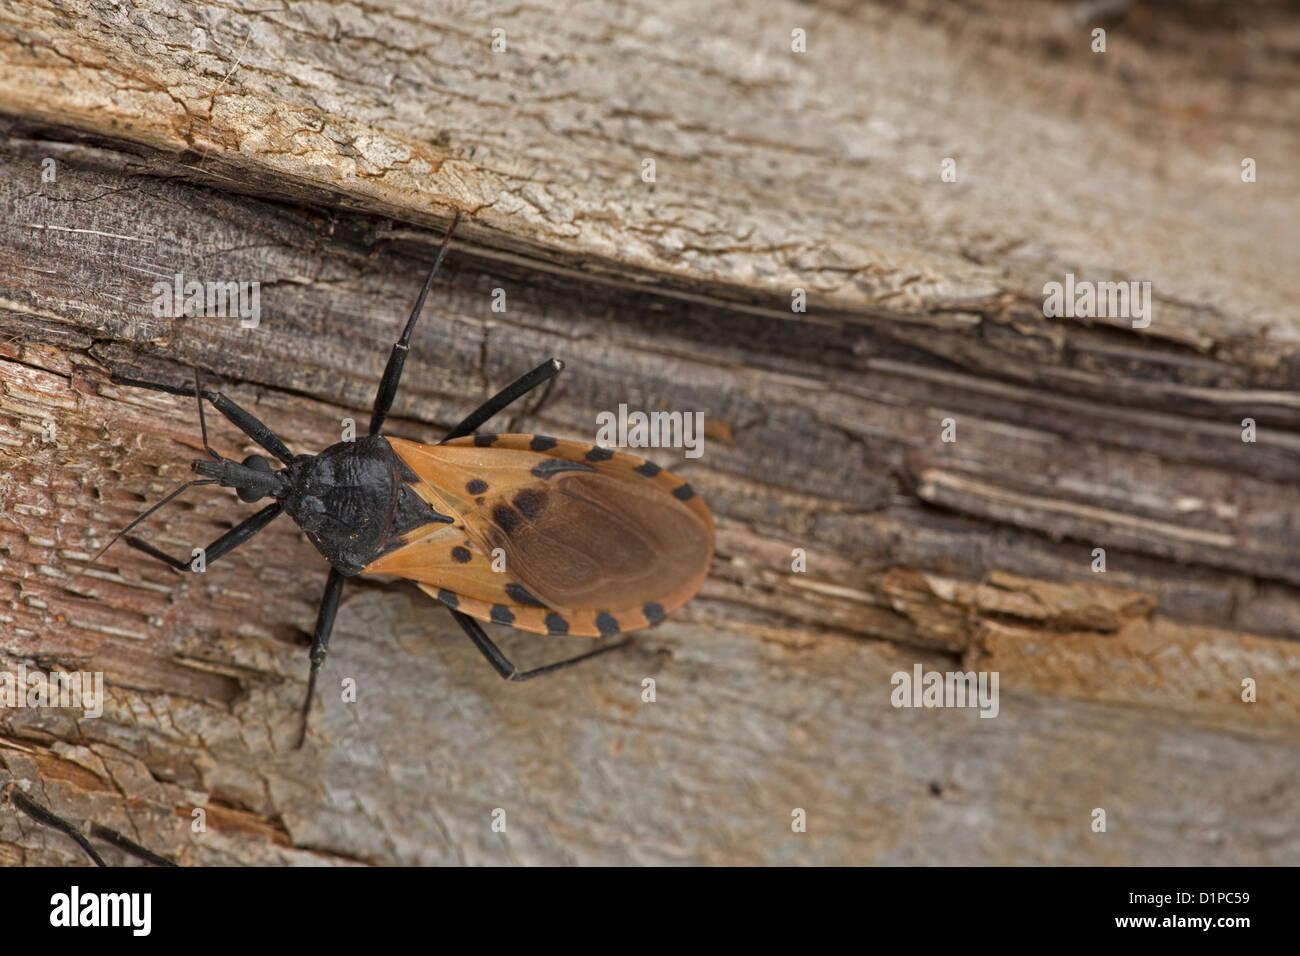 Kissing Bug Triatoma Dimidiata, der großen Vektor der Trypanosomen Trypanosoma in Costa Rica, überträgt Stockbild